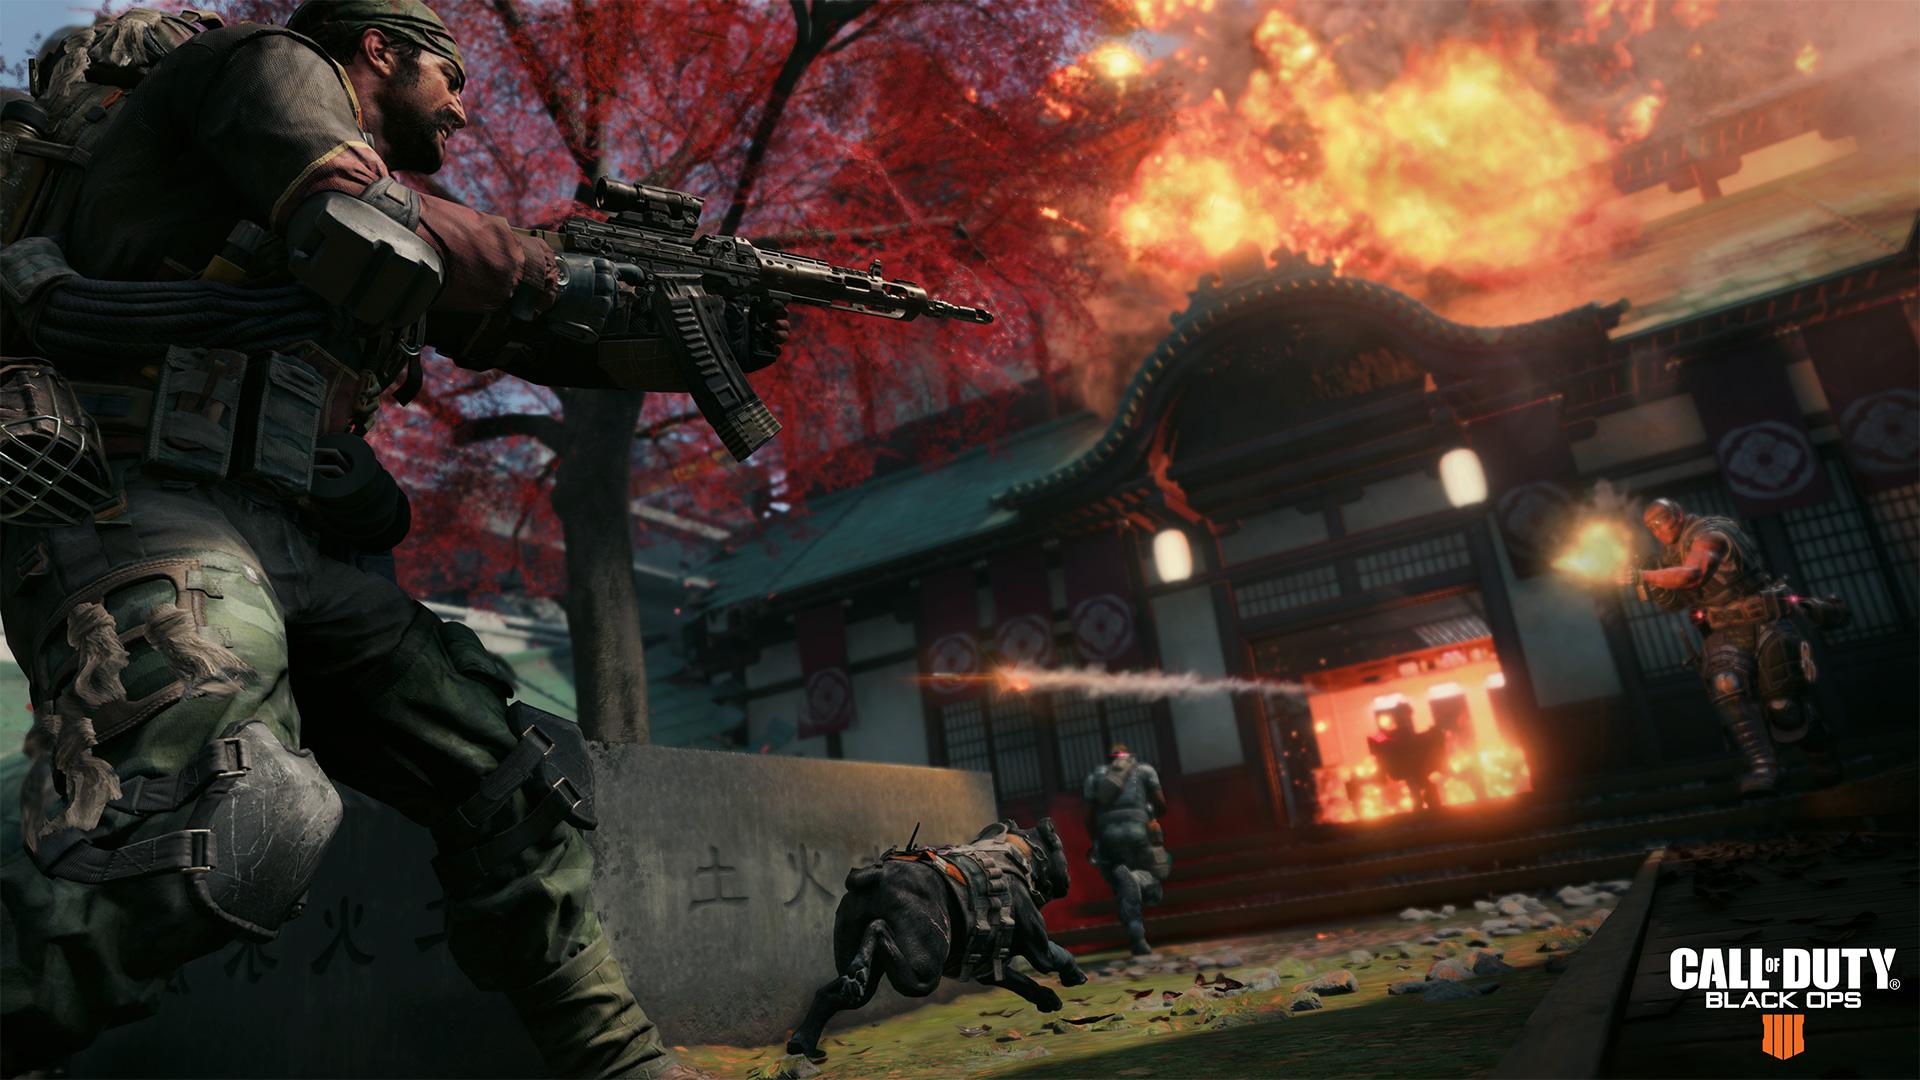 Black_Ops_4_Multiplayer_Beta_screenshot1_1533305972.jpg